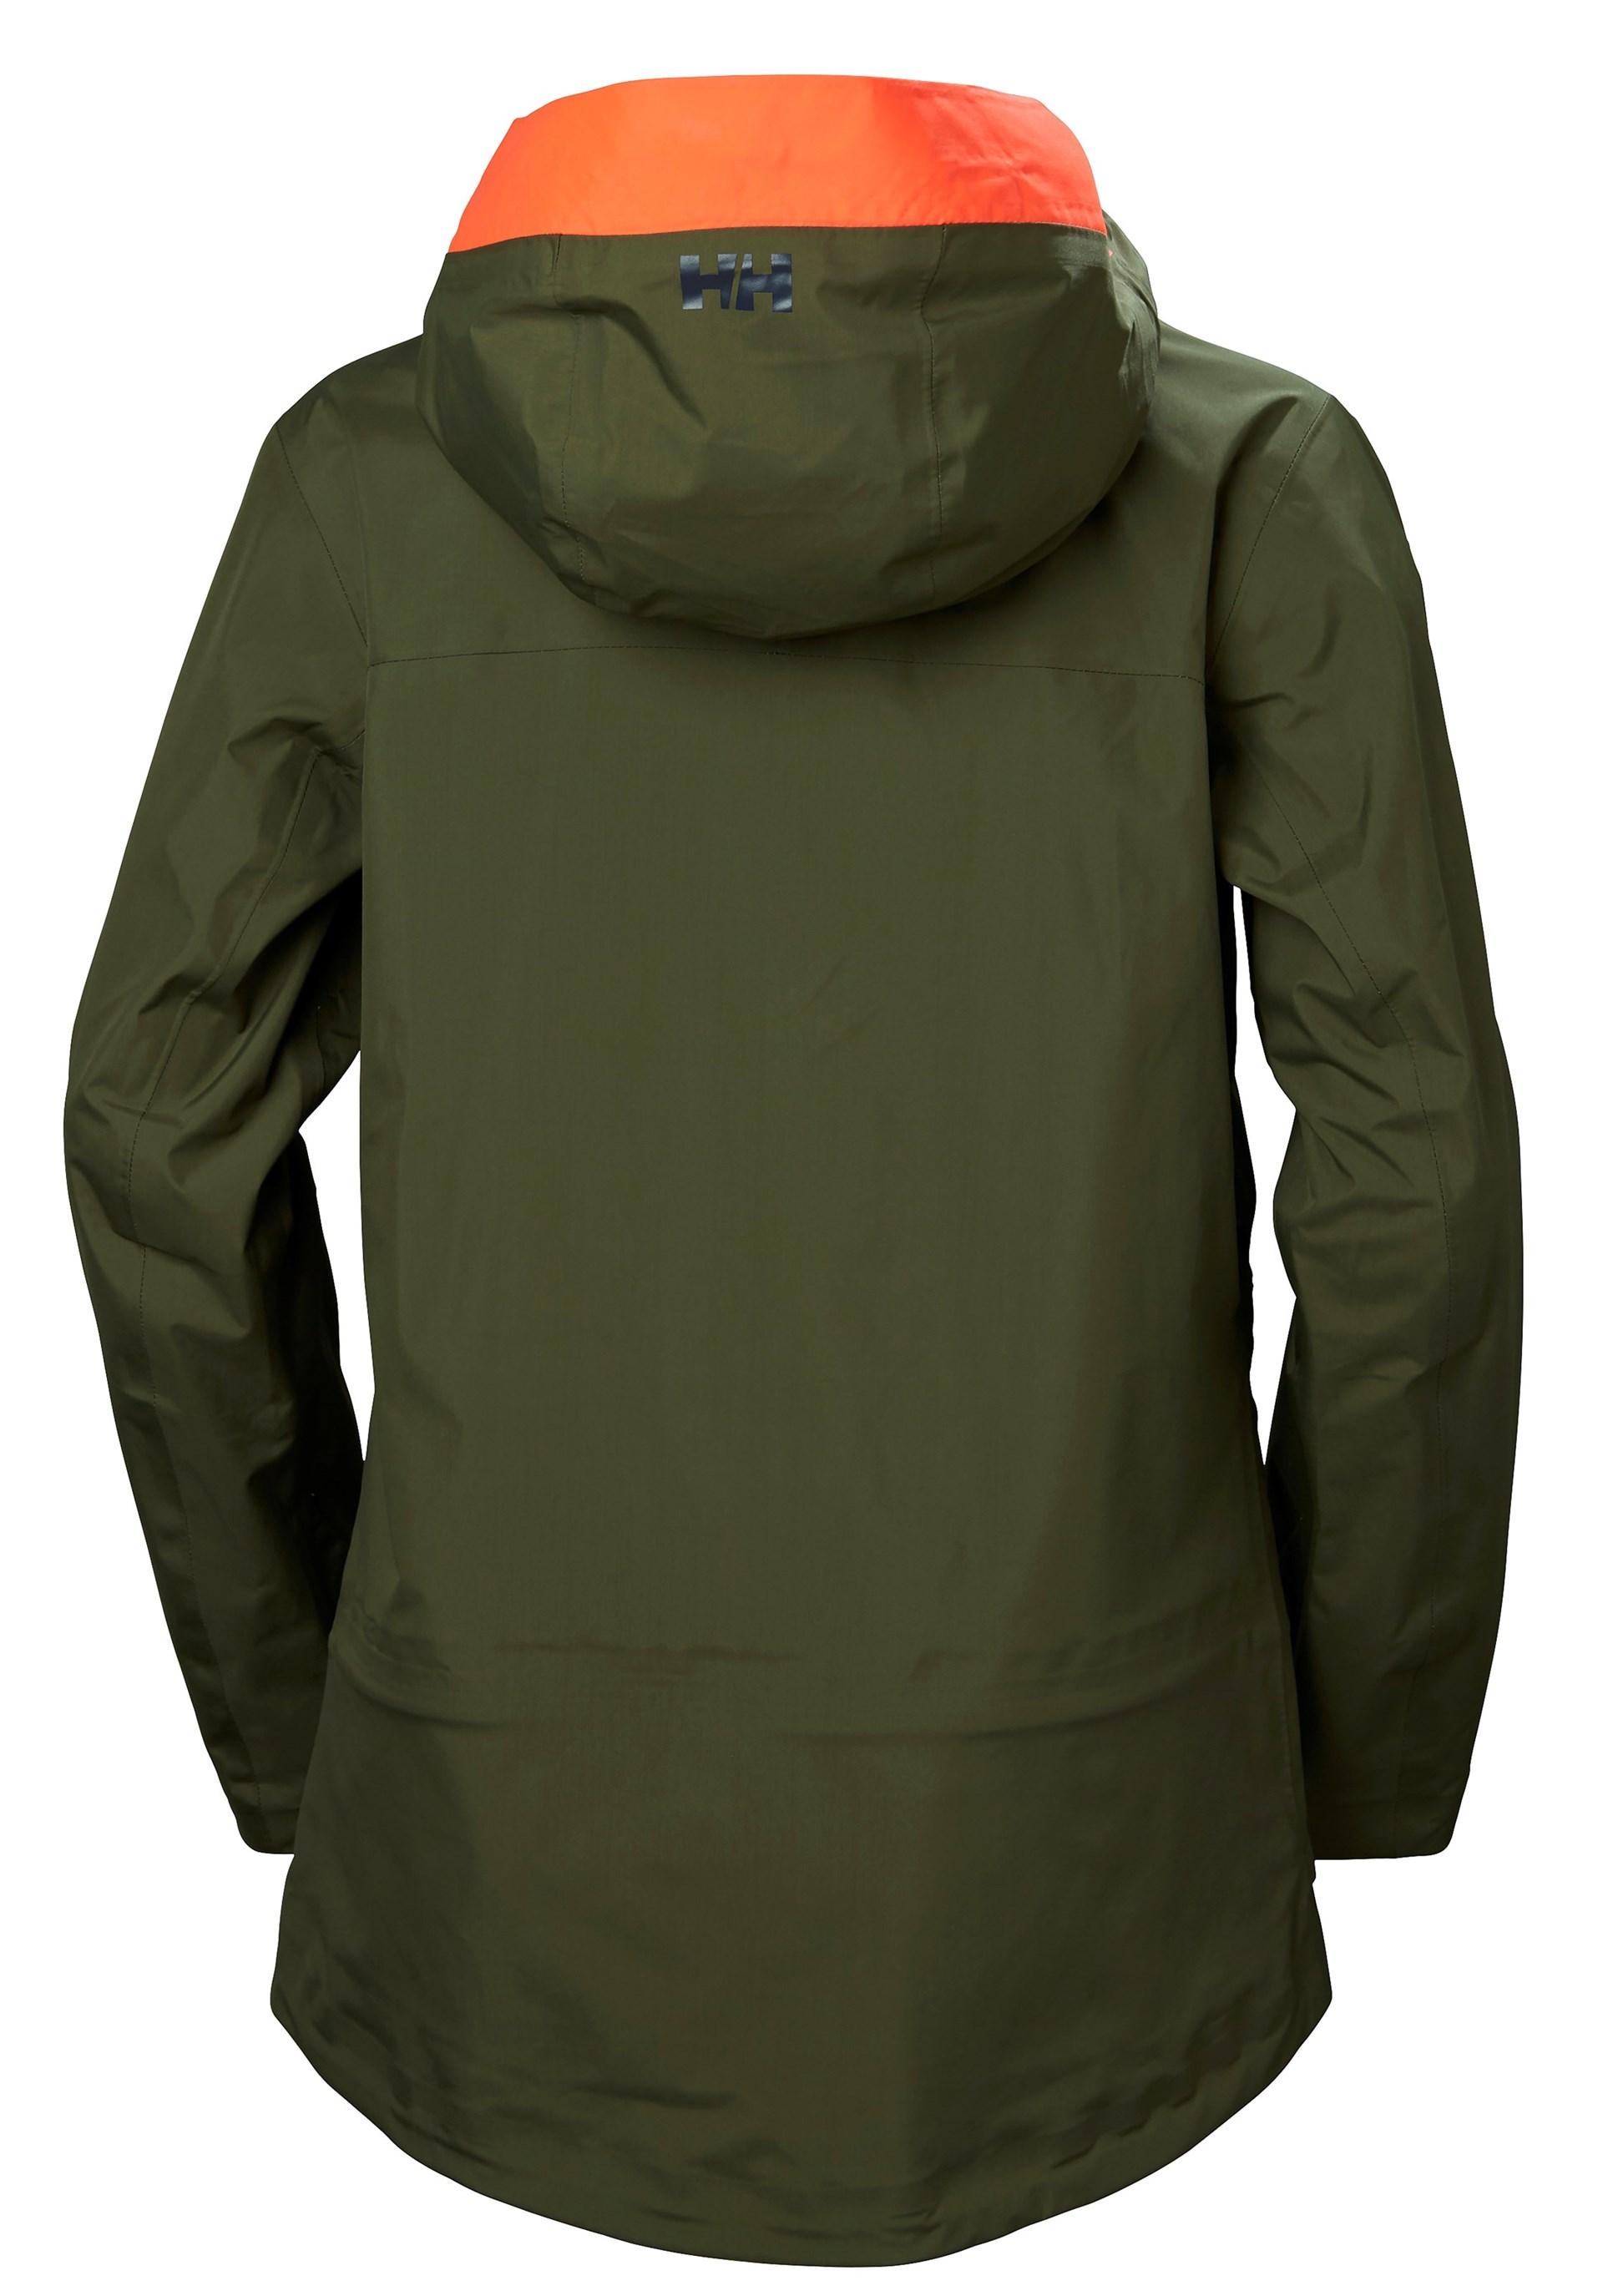 43be651e ... Bilde: Helly Hansen W Kvitegga Shell Jacket, skijakke dame - Ivy Green  65575- ...